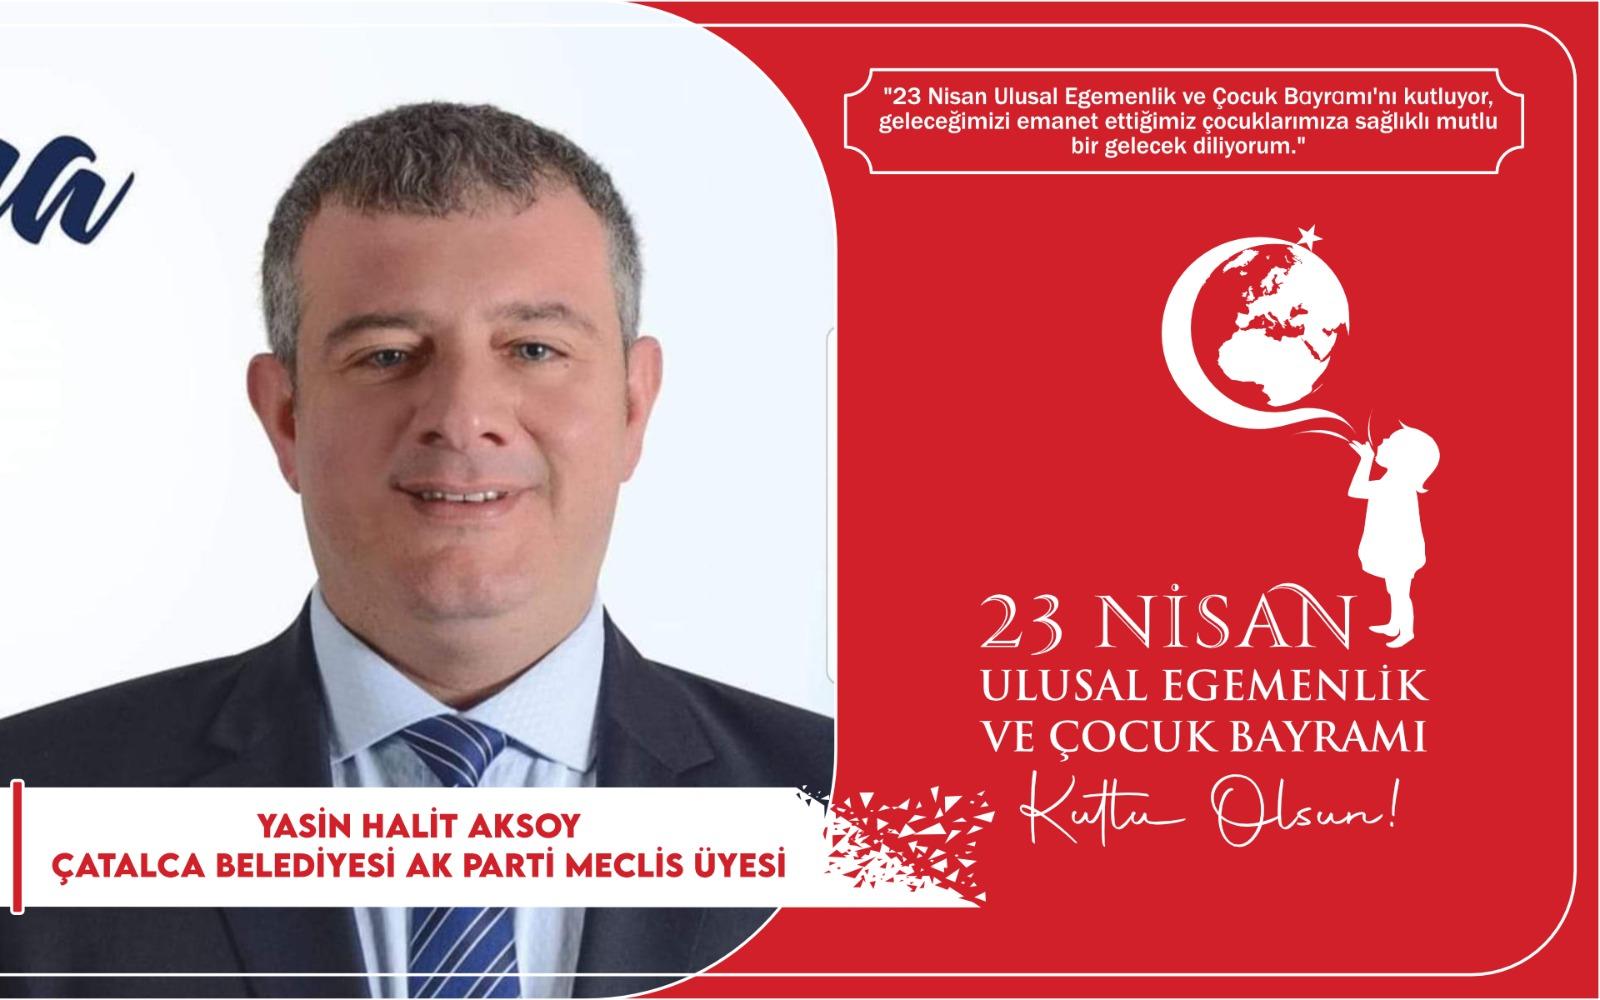 Y.Halit Aksoy'dan Kutlama Mesajı